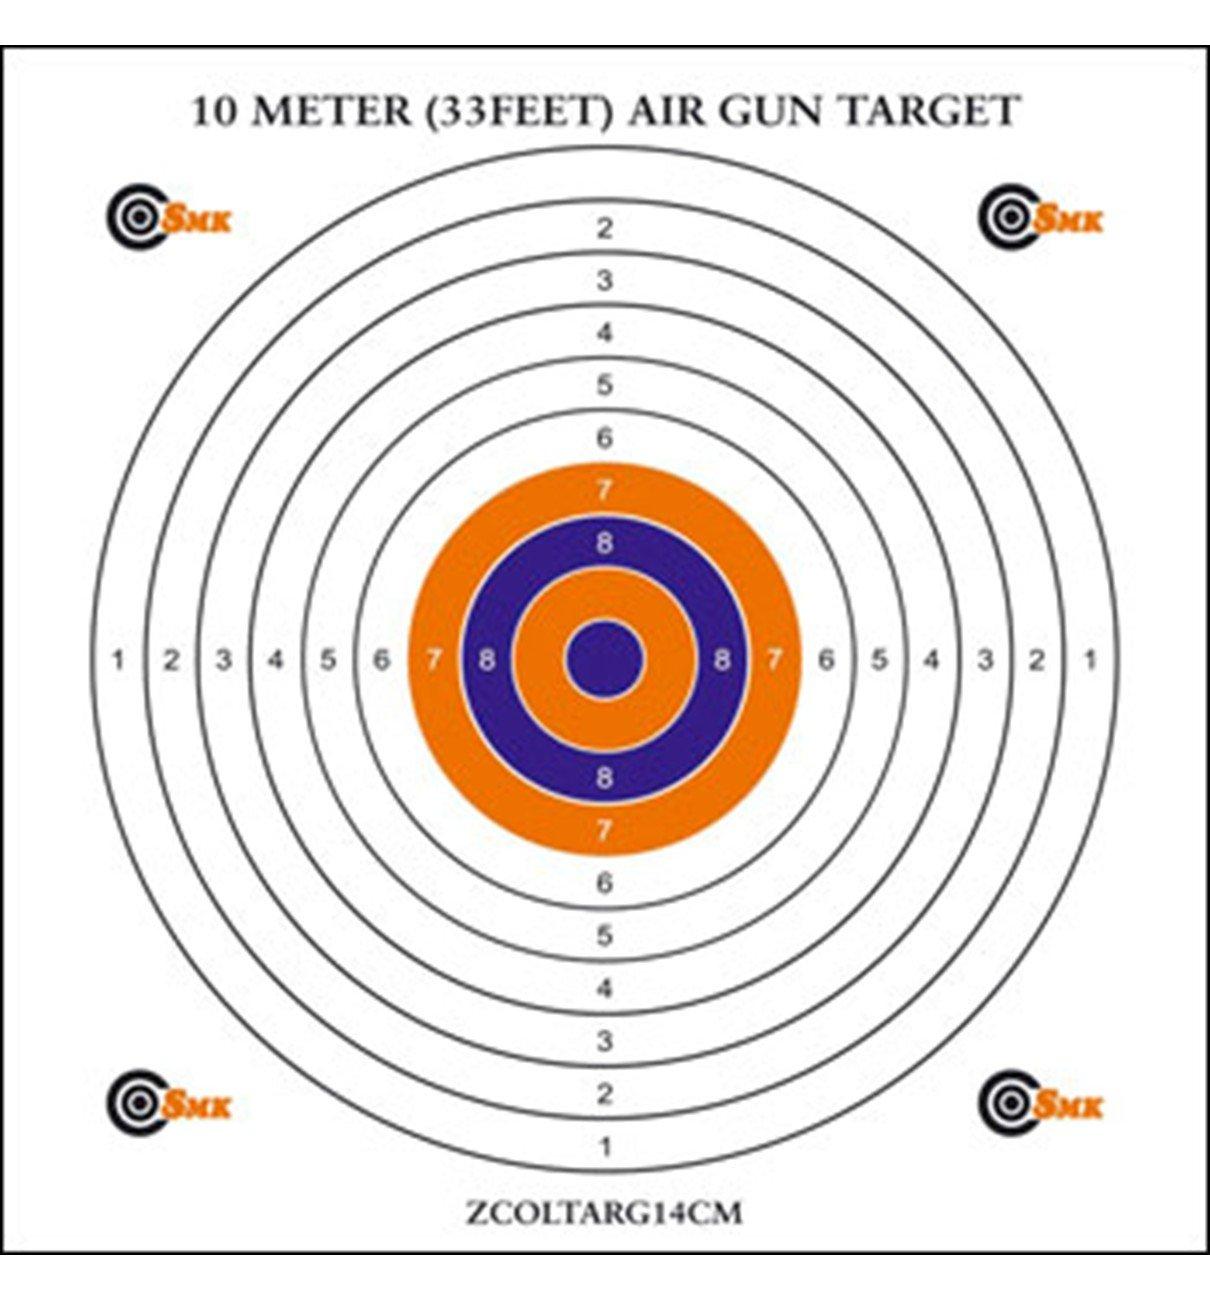 Air Rifle Target Shooting Air Rifle Targets Shooting